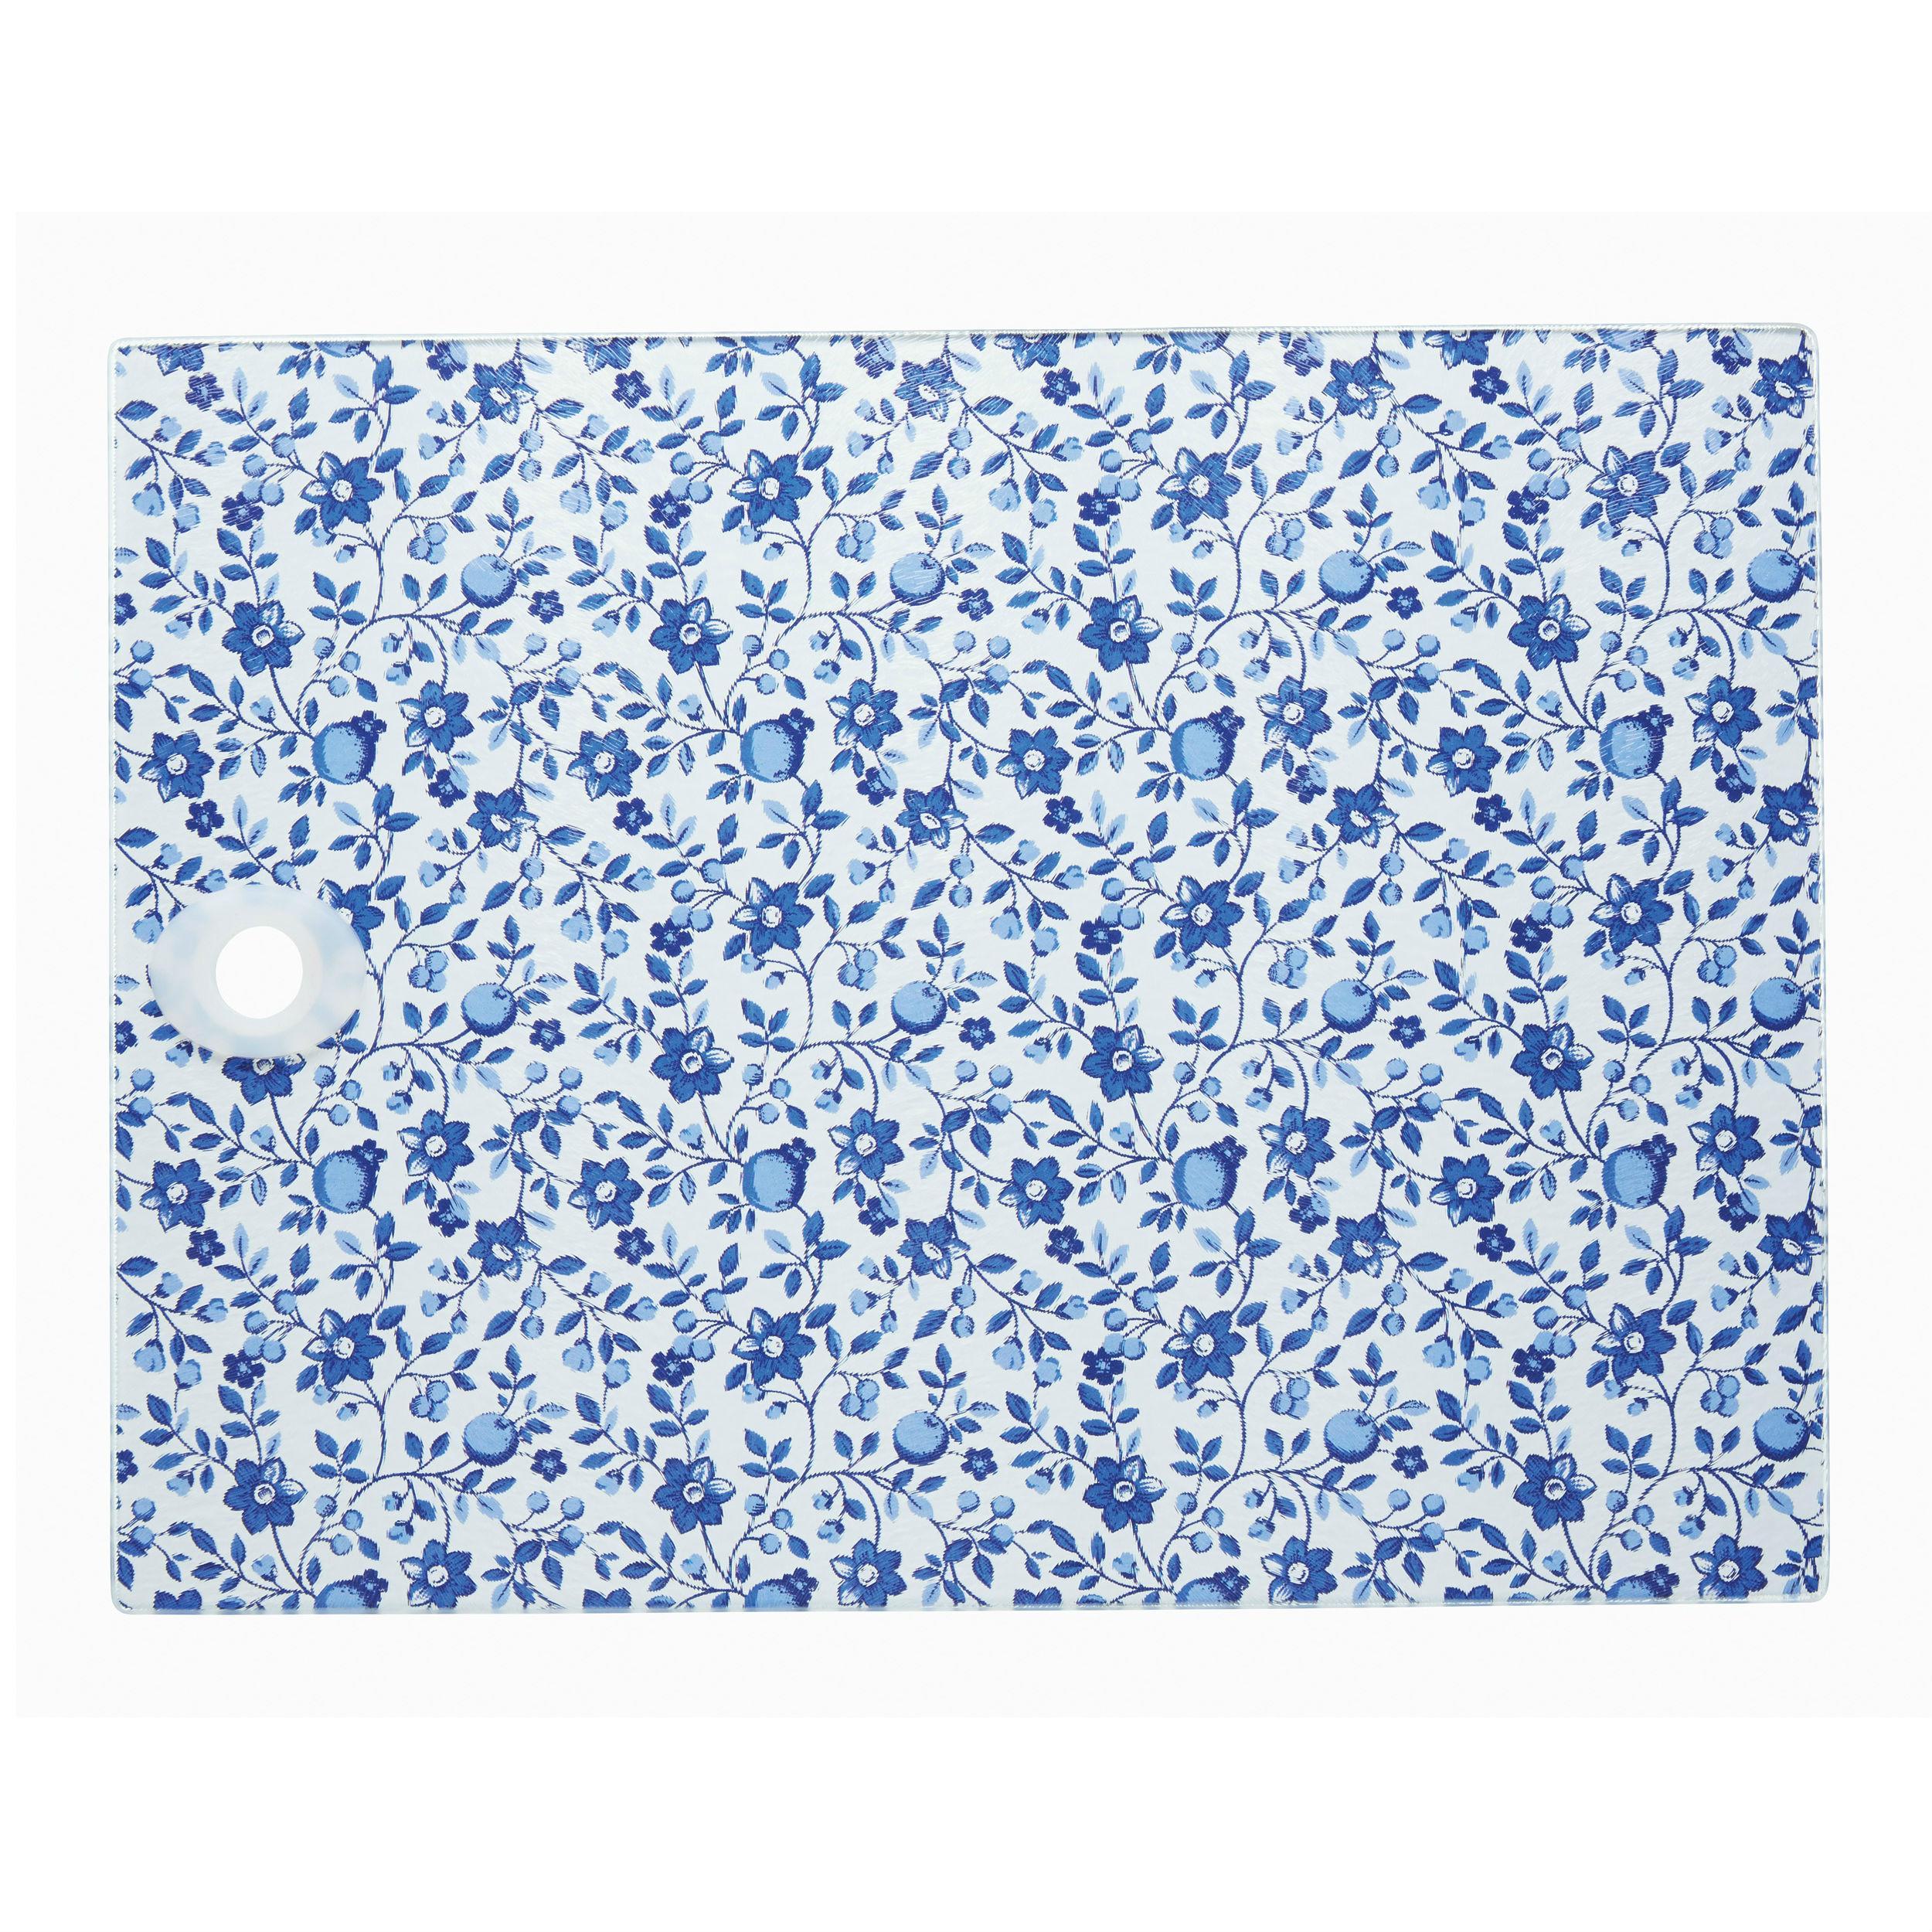 KitchenCraft \'Traditional Blue\' Toughened Glass Worktop Saver, 40 x ...